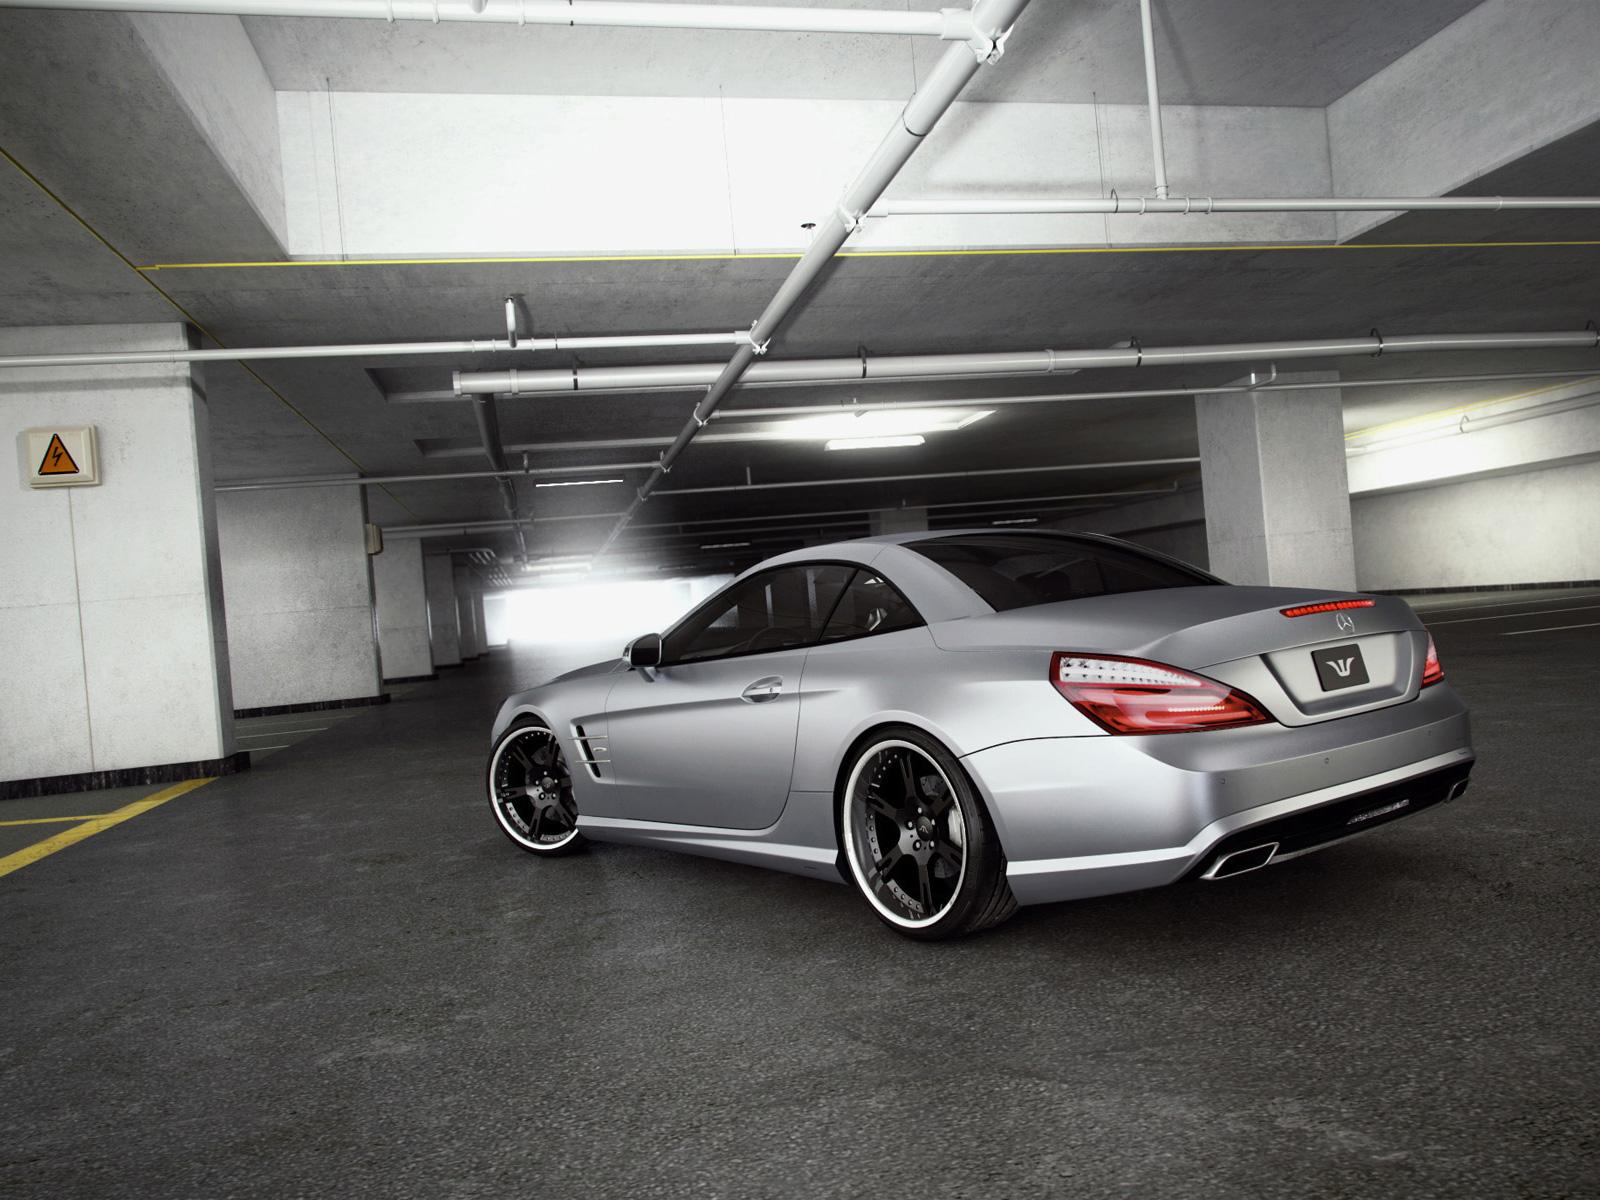 Nancys car designs 2013 mercedes benz sl500 for Mercedes benz sl 2013